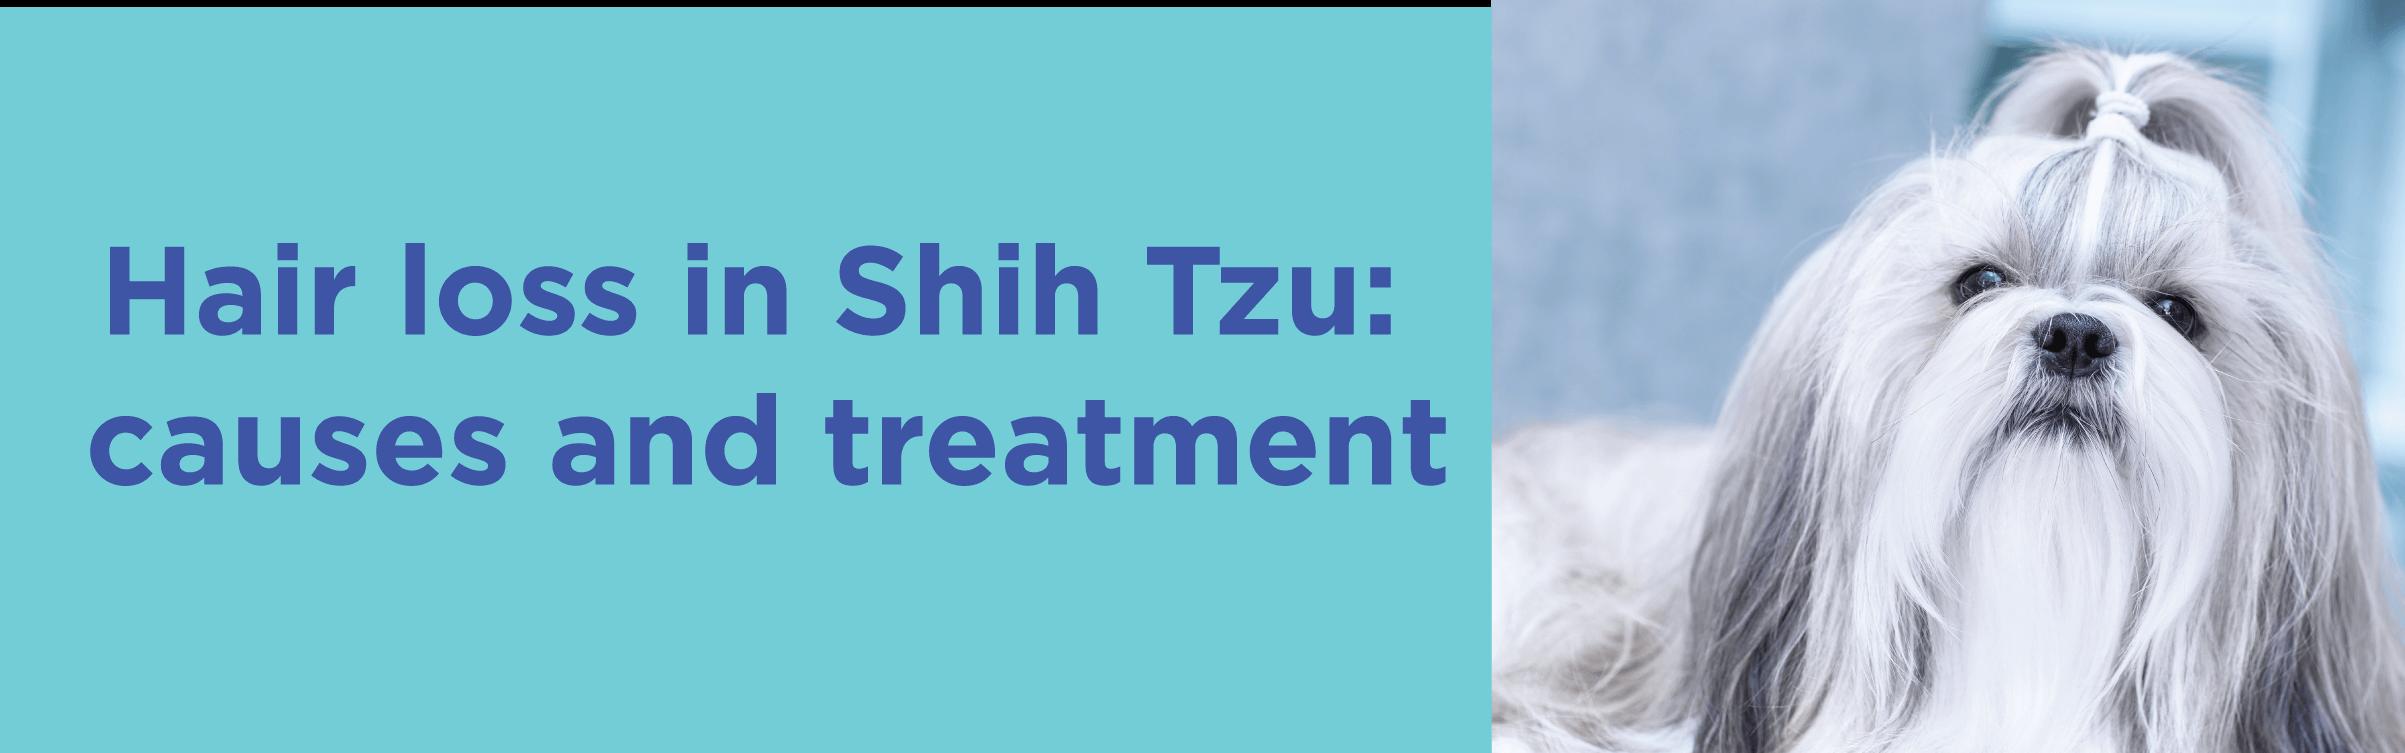 Hair loss in Shih Tzu causes